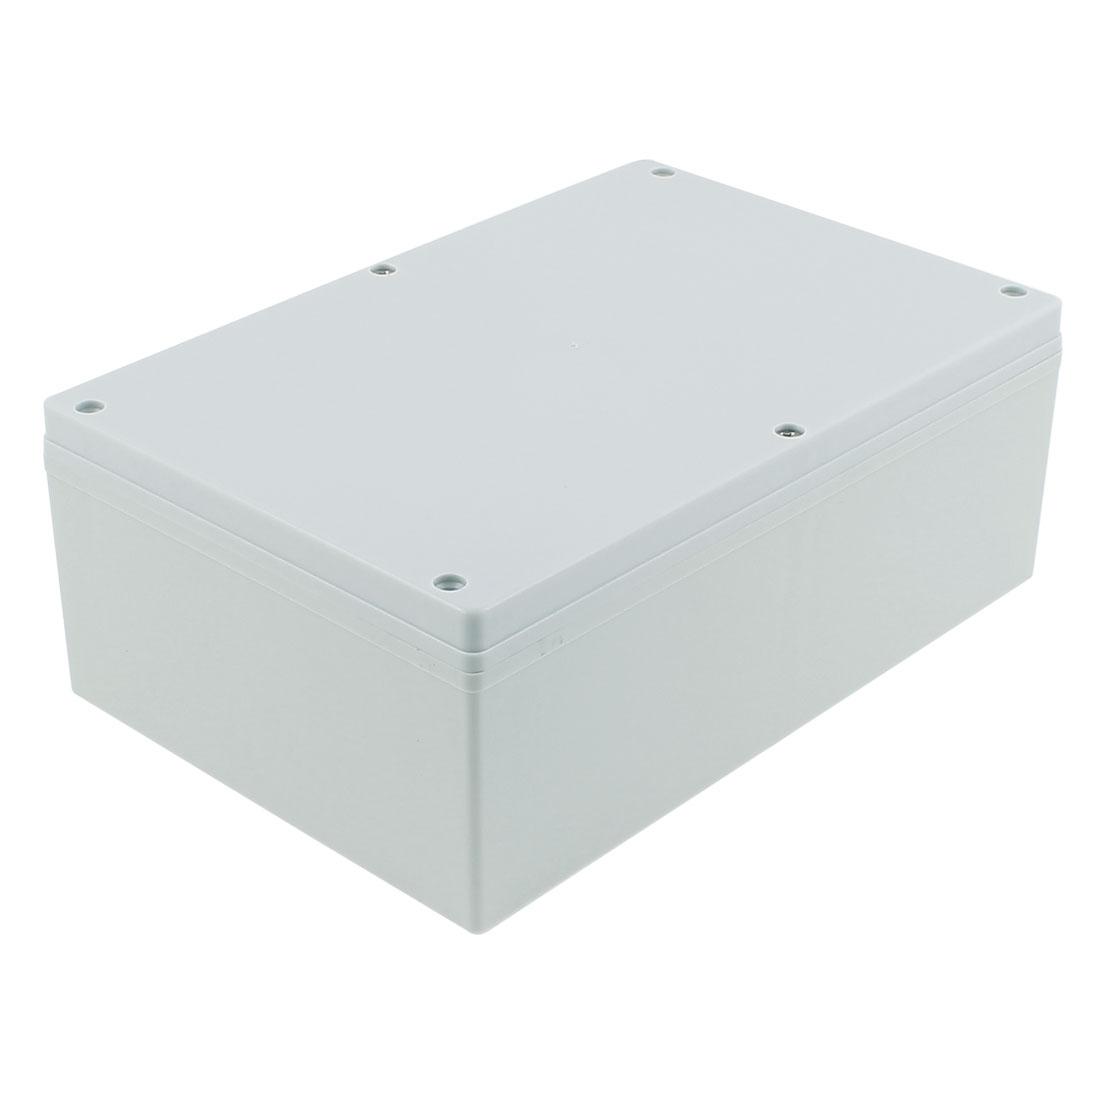 240 x 160 x 90mm Dustproof IP65 Junction Box Terminal Connection Box Enclosure